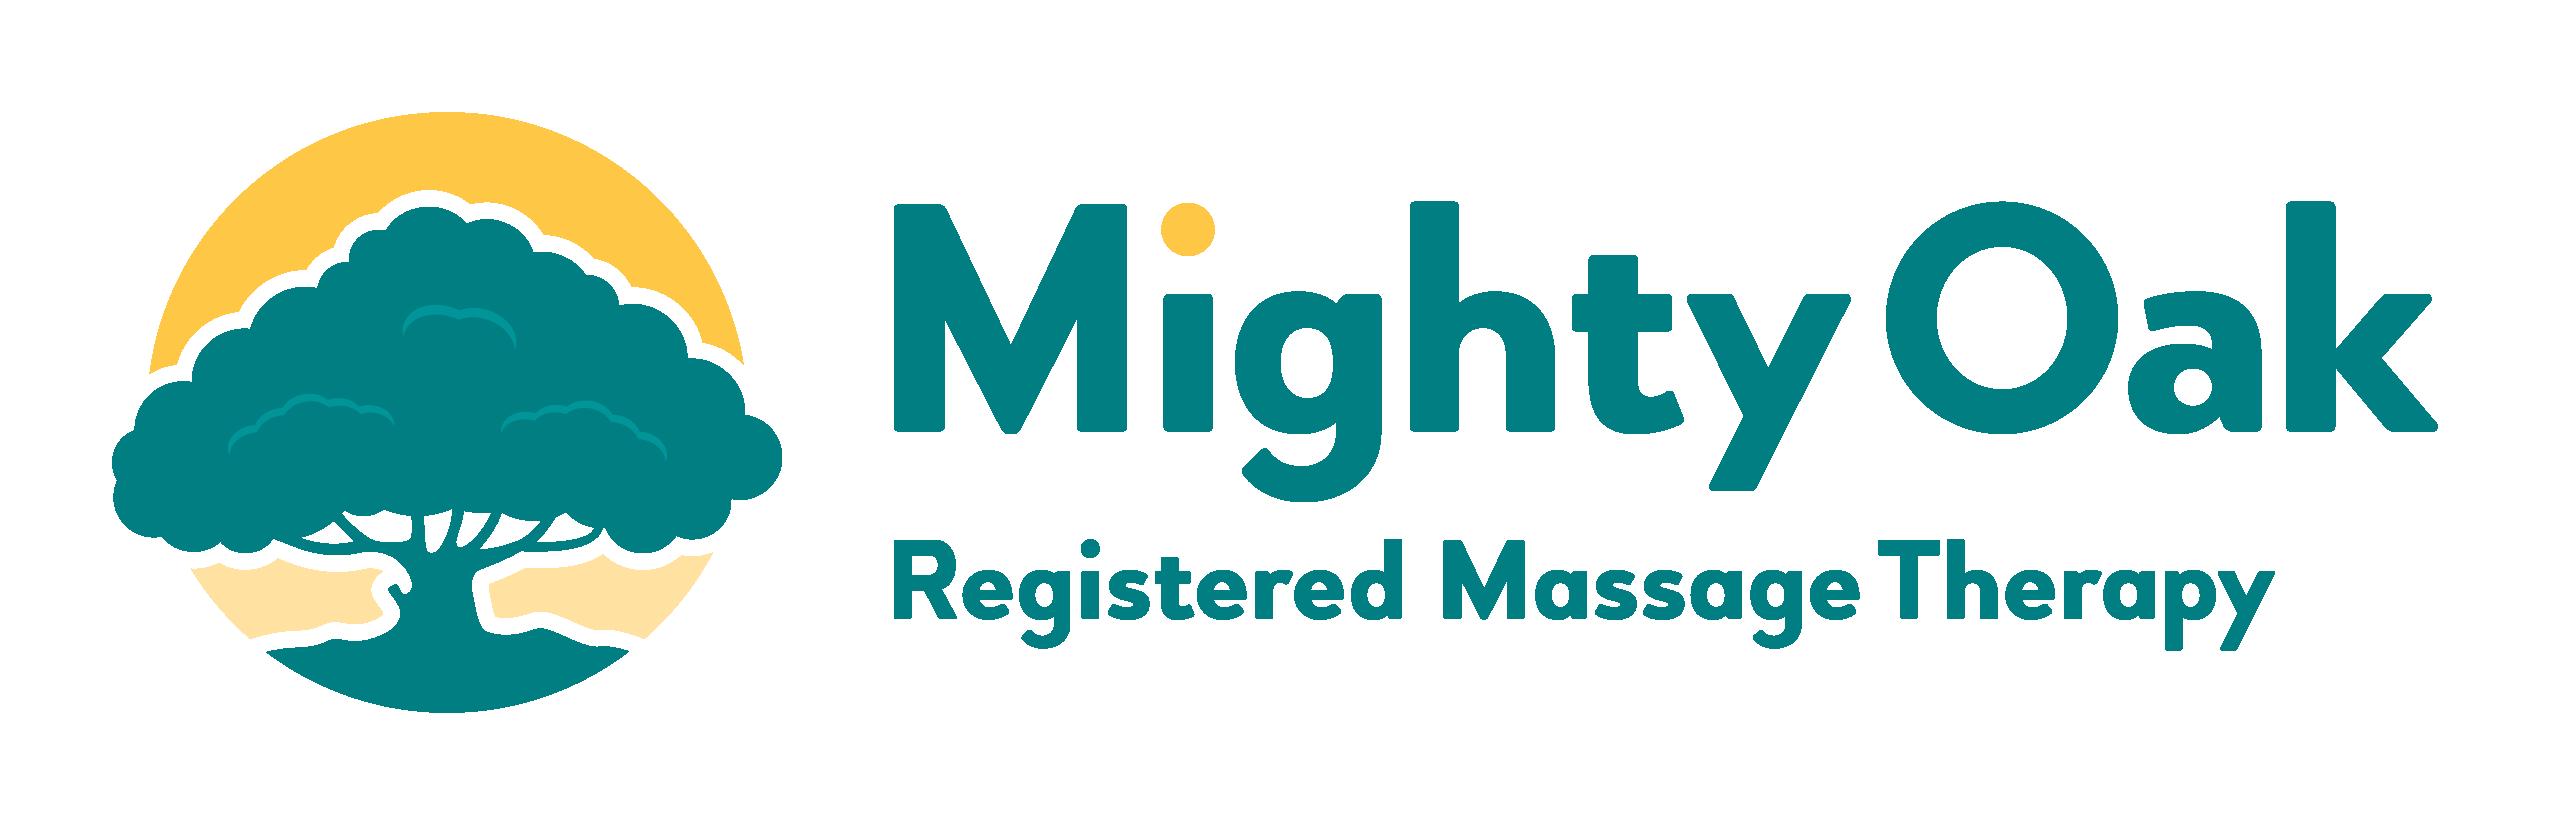 Mighty Oak Massage Therapy